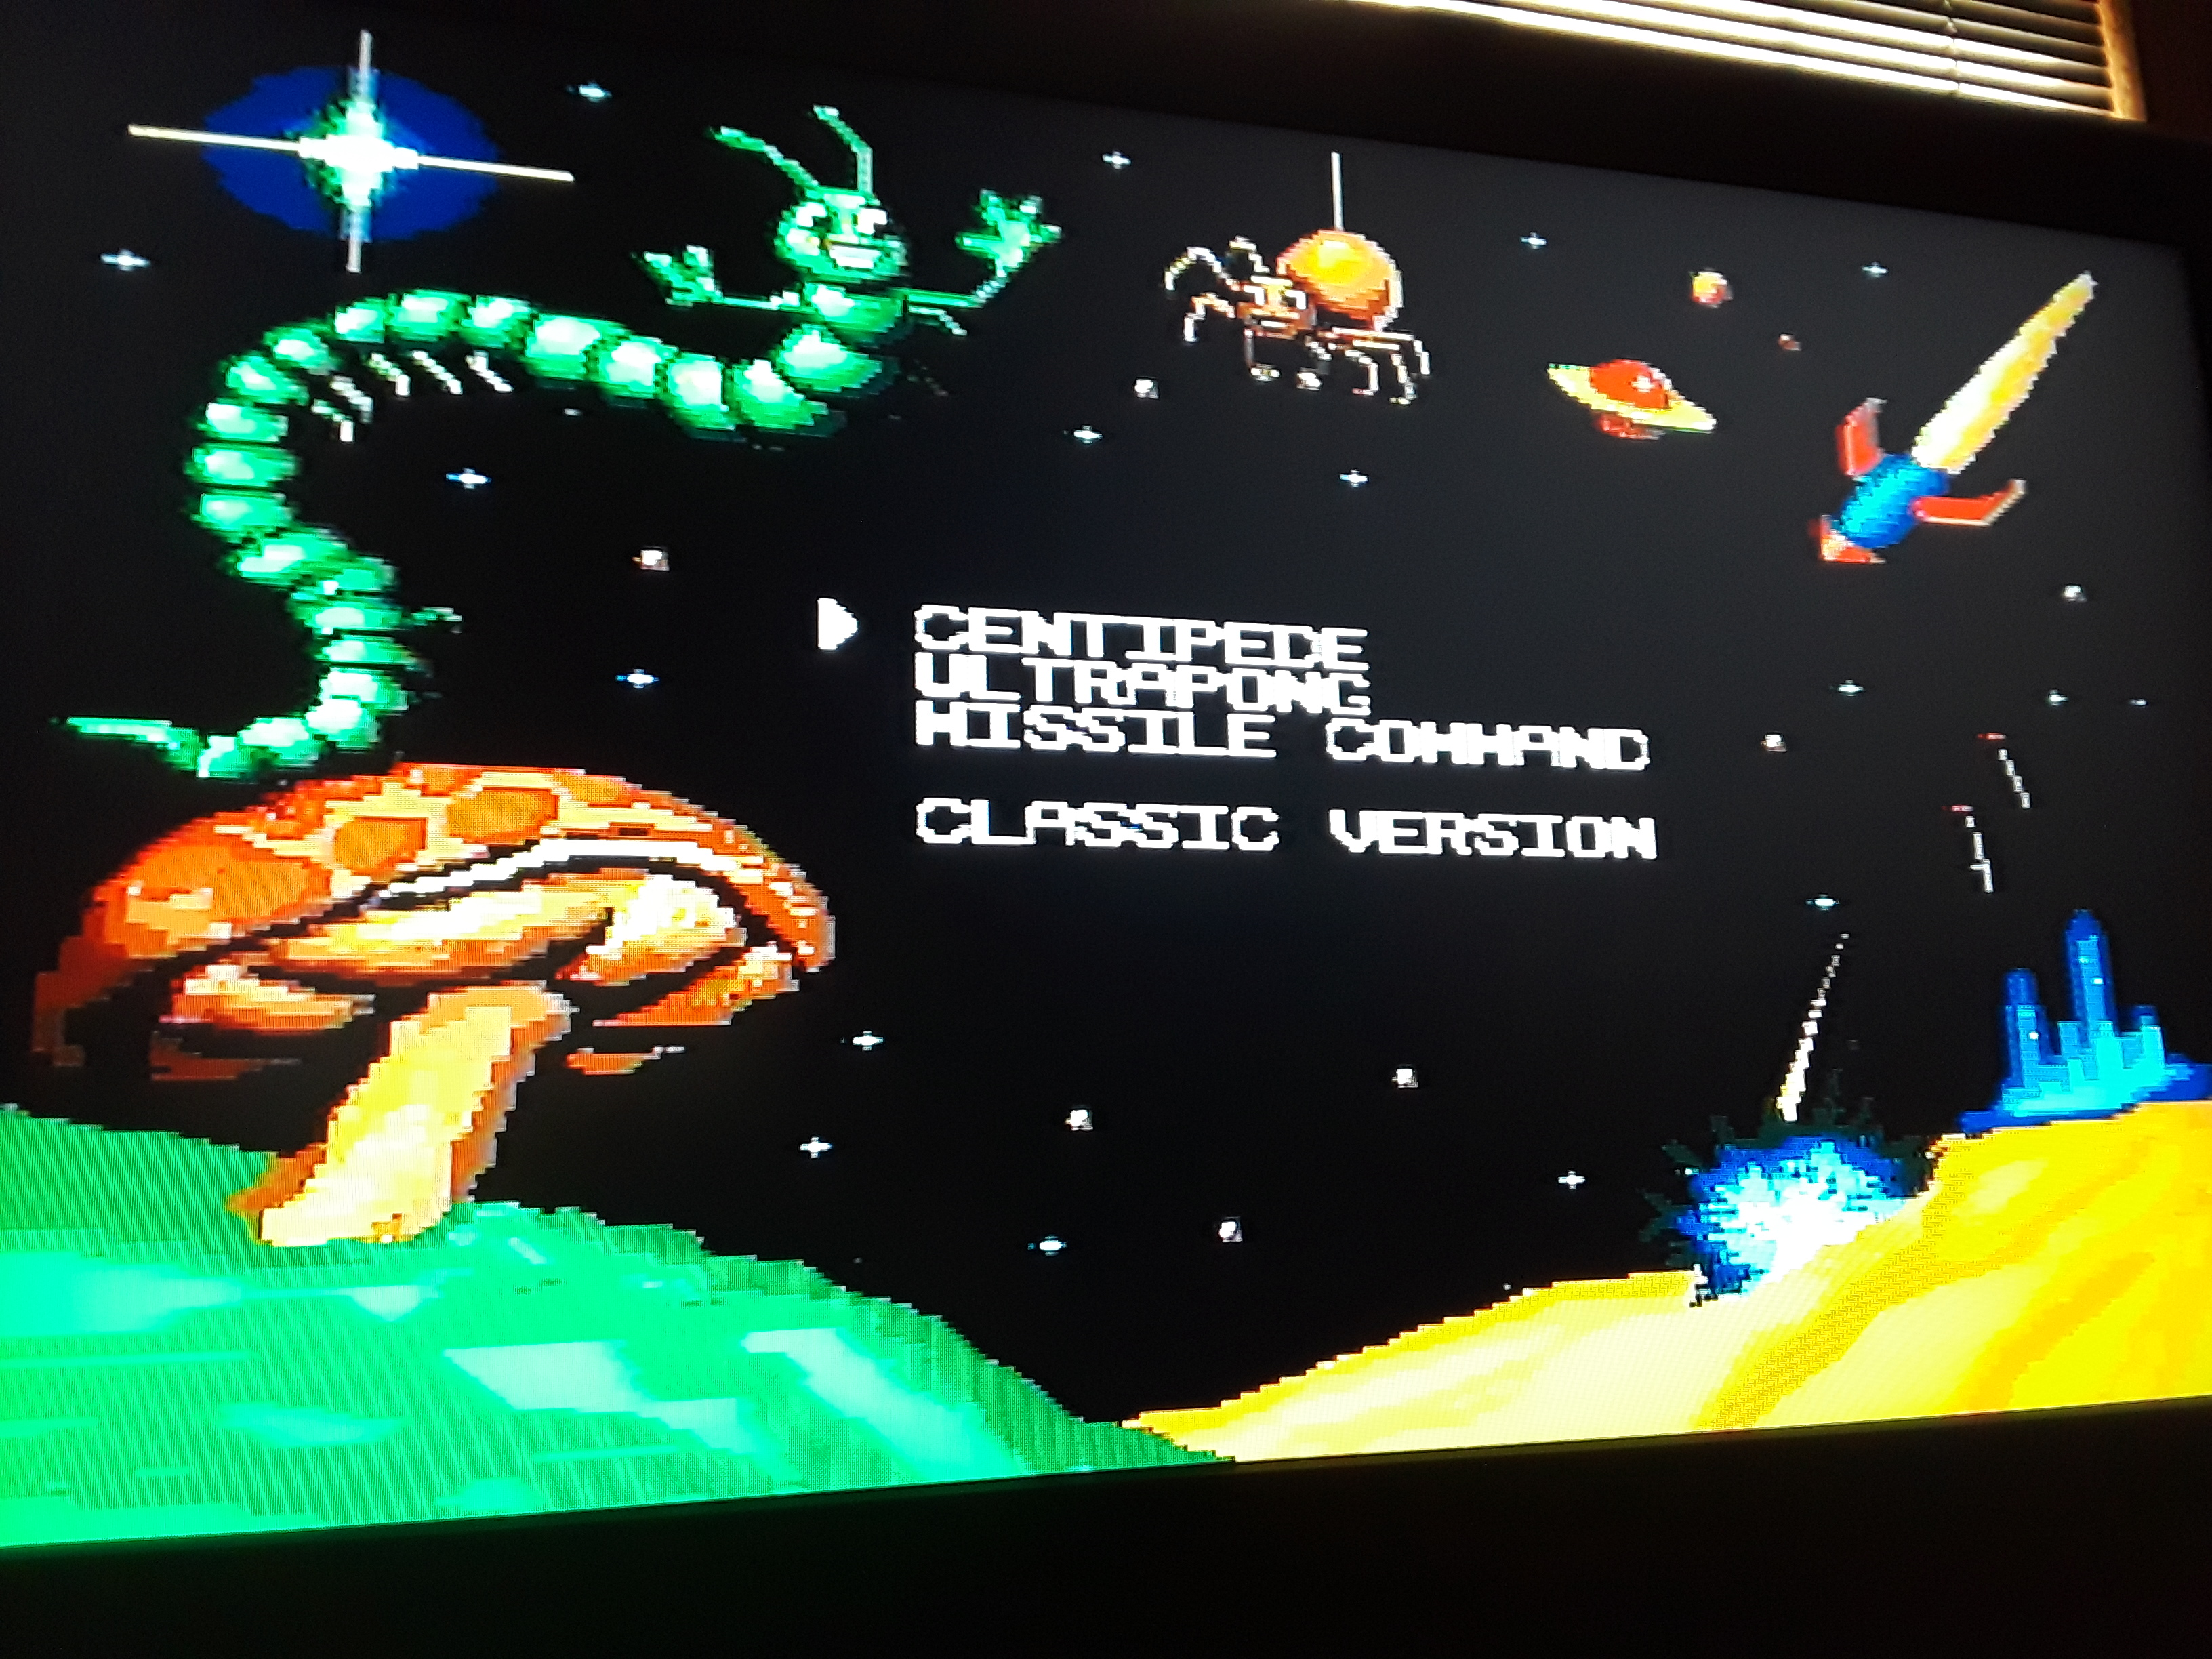 JML101582: Arcade Classics: Centipede (Sega Genesis / MegaDrive Emulated) 10,150 points on 2018-08-18 19:54:58